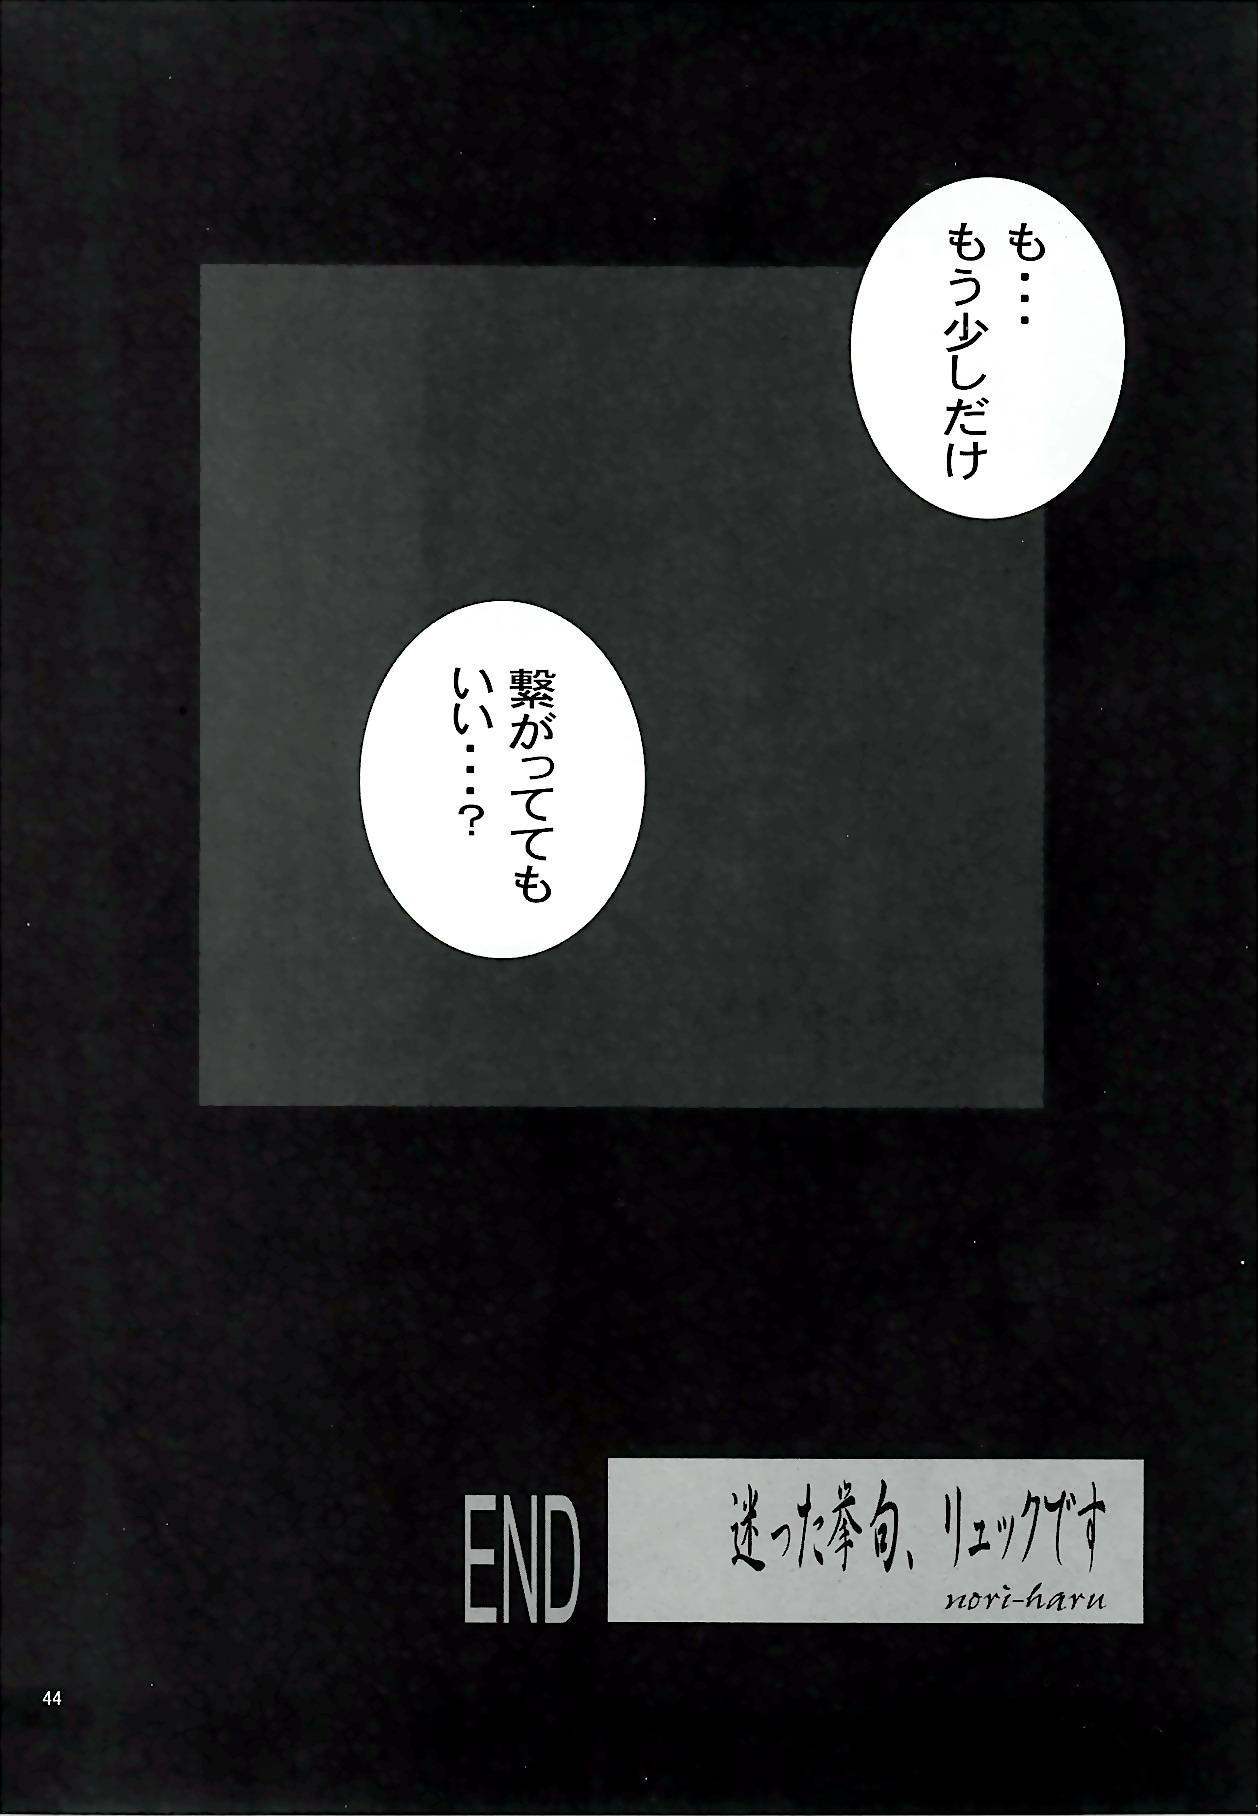 NORI-HARU COMPLETE 1 44